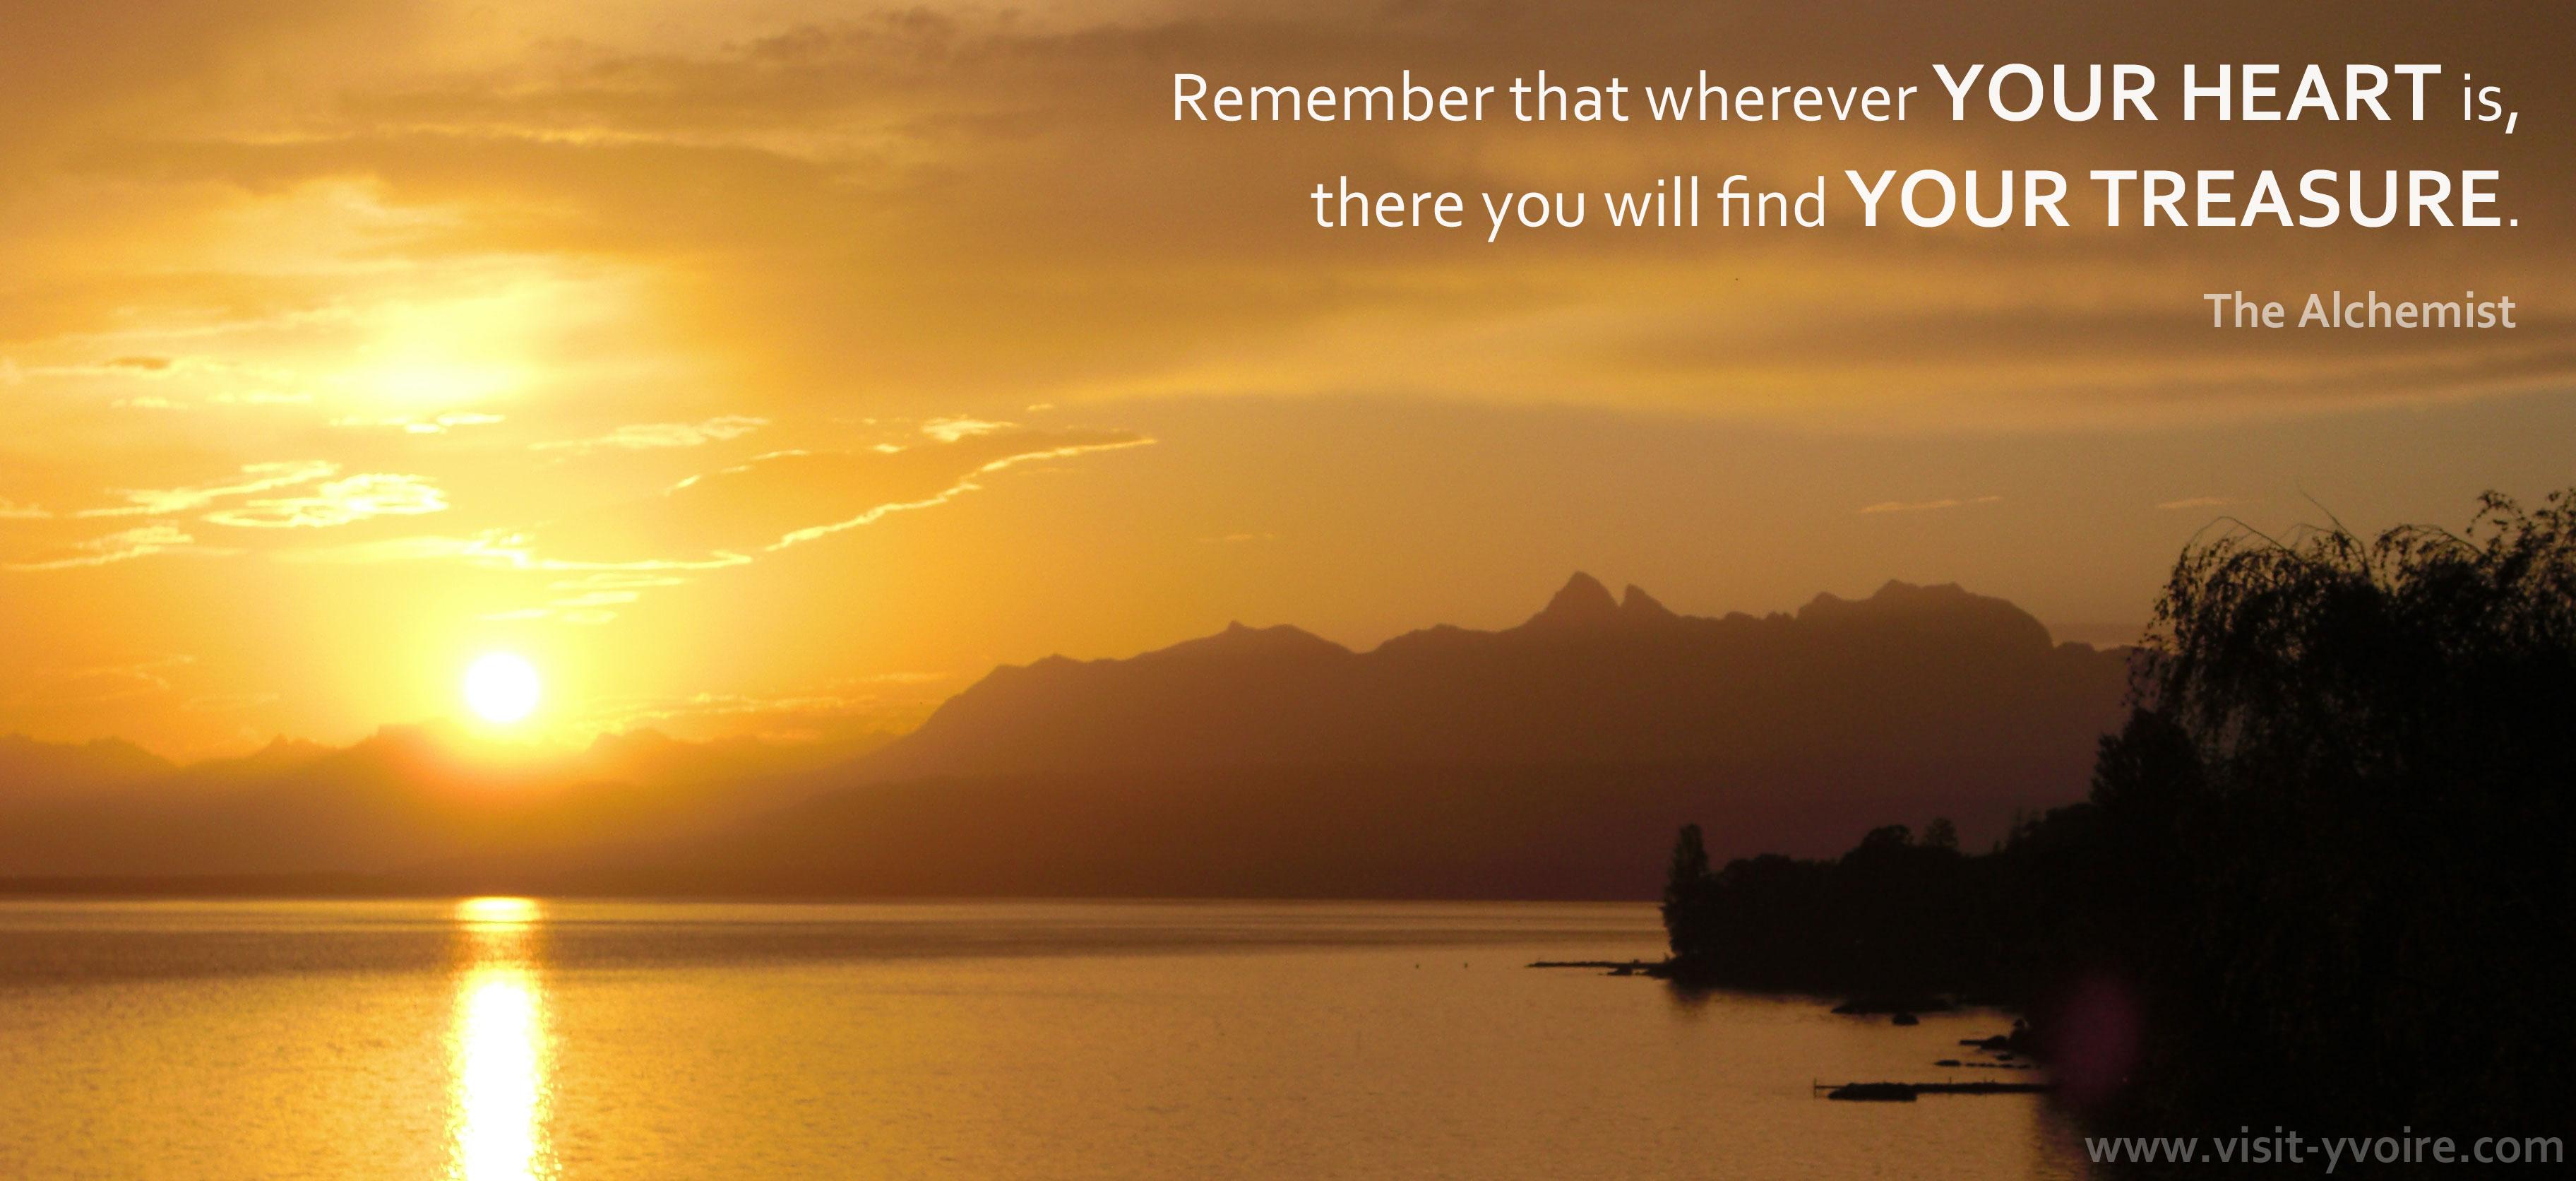 Parce que, là où sera ton coeur, là sera ton trésor